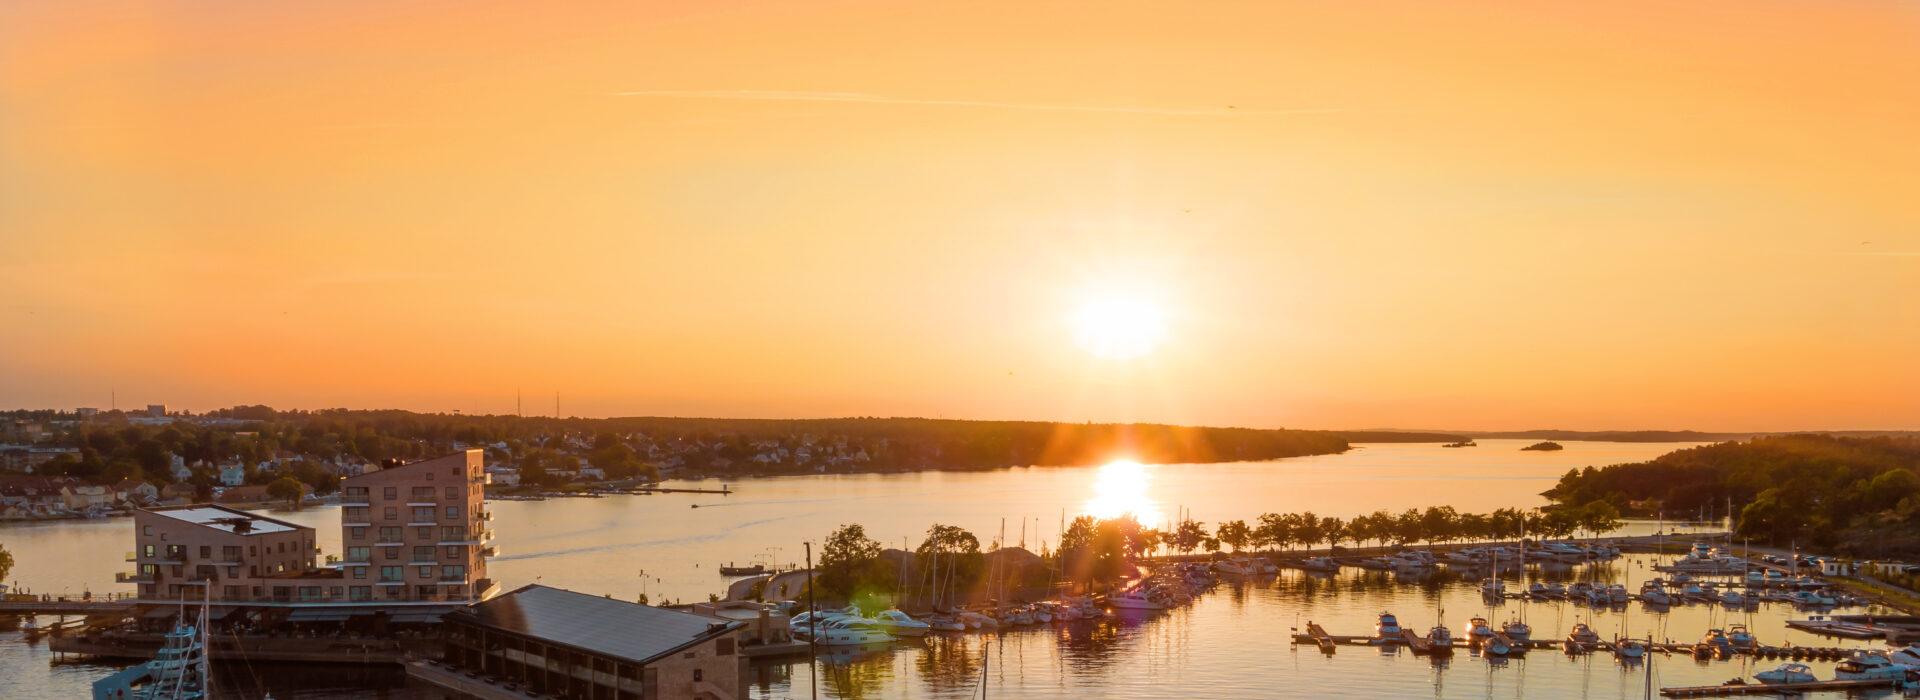 Västervik Årets Sommarstad 2021